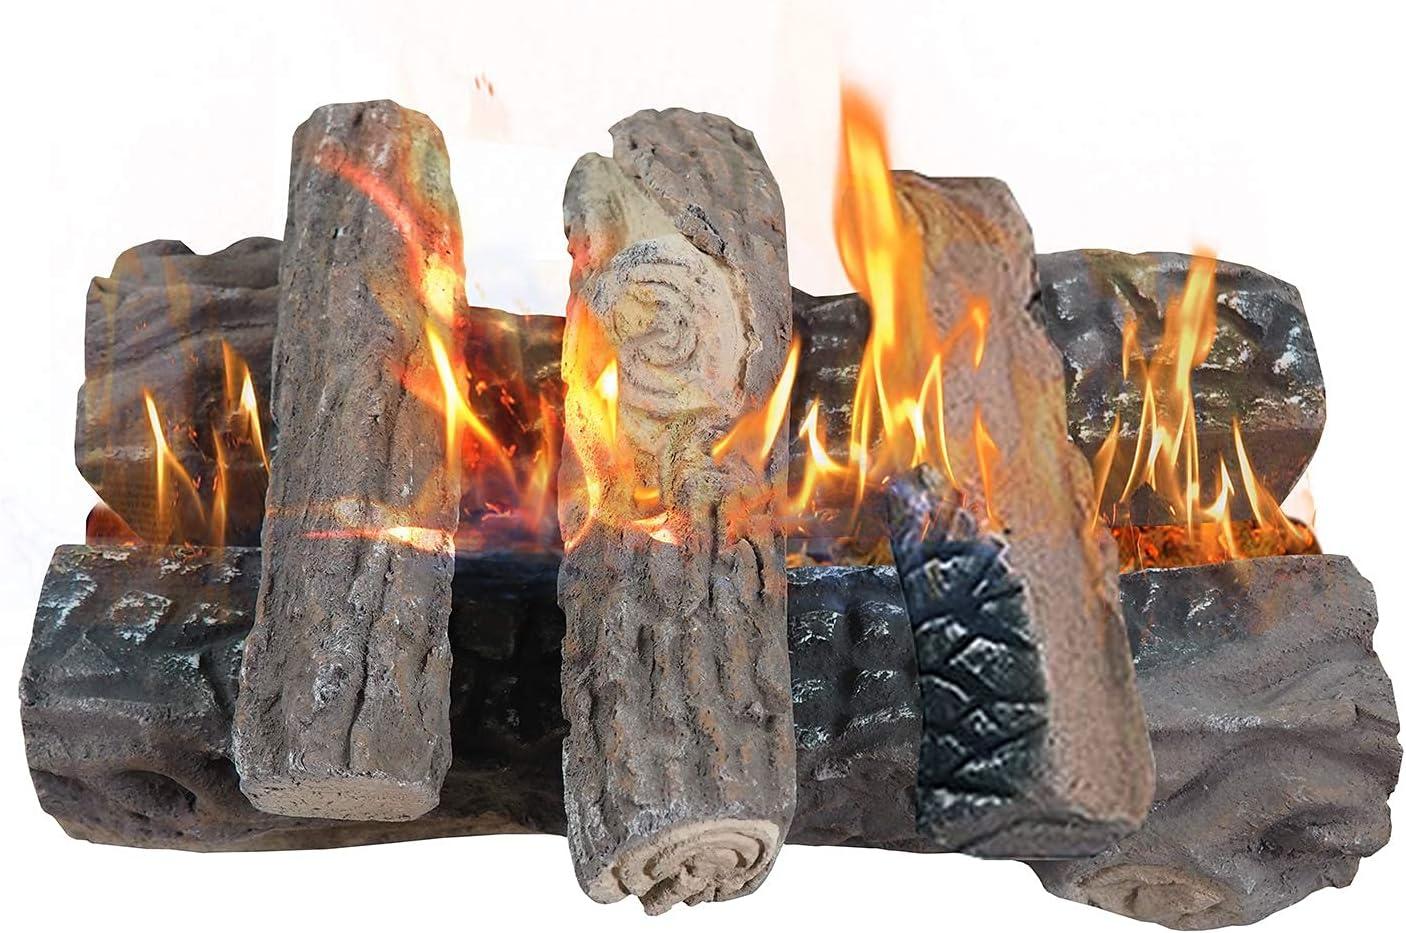 Skypatio Gas Fireplace Ranking TOP19 Logs 5 Ceramic Pieces Regular discount Fiber Wood U